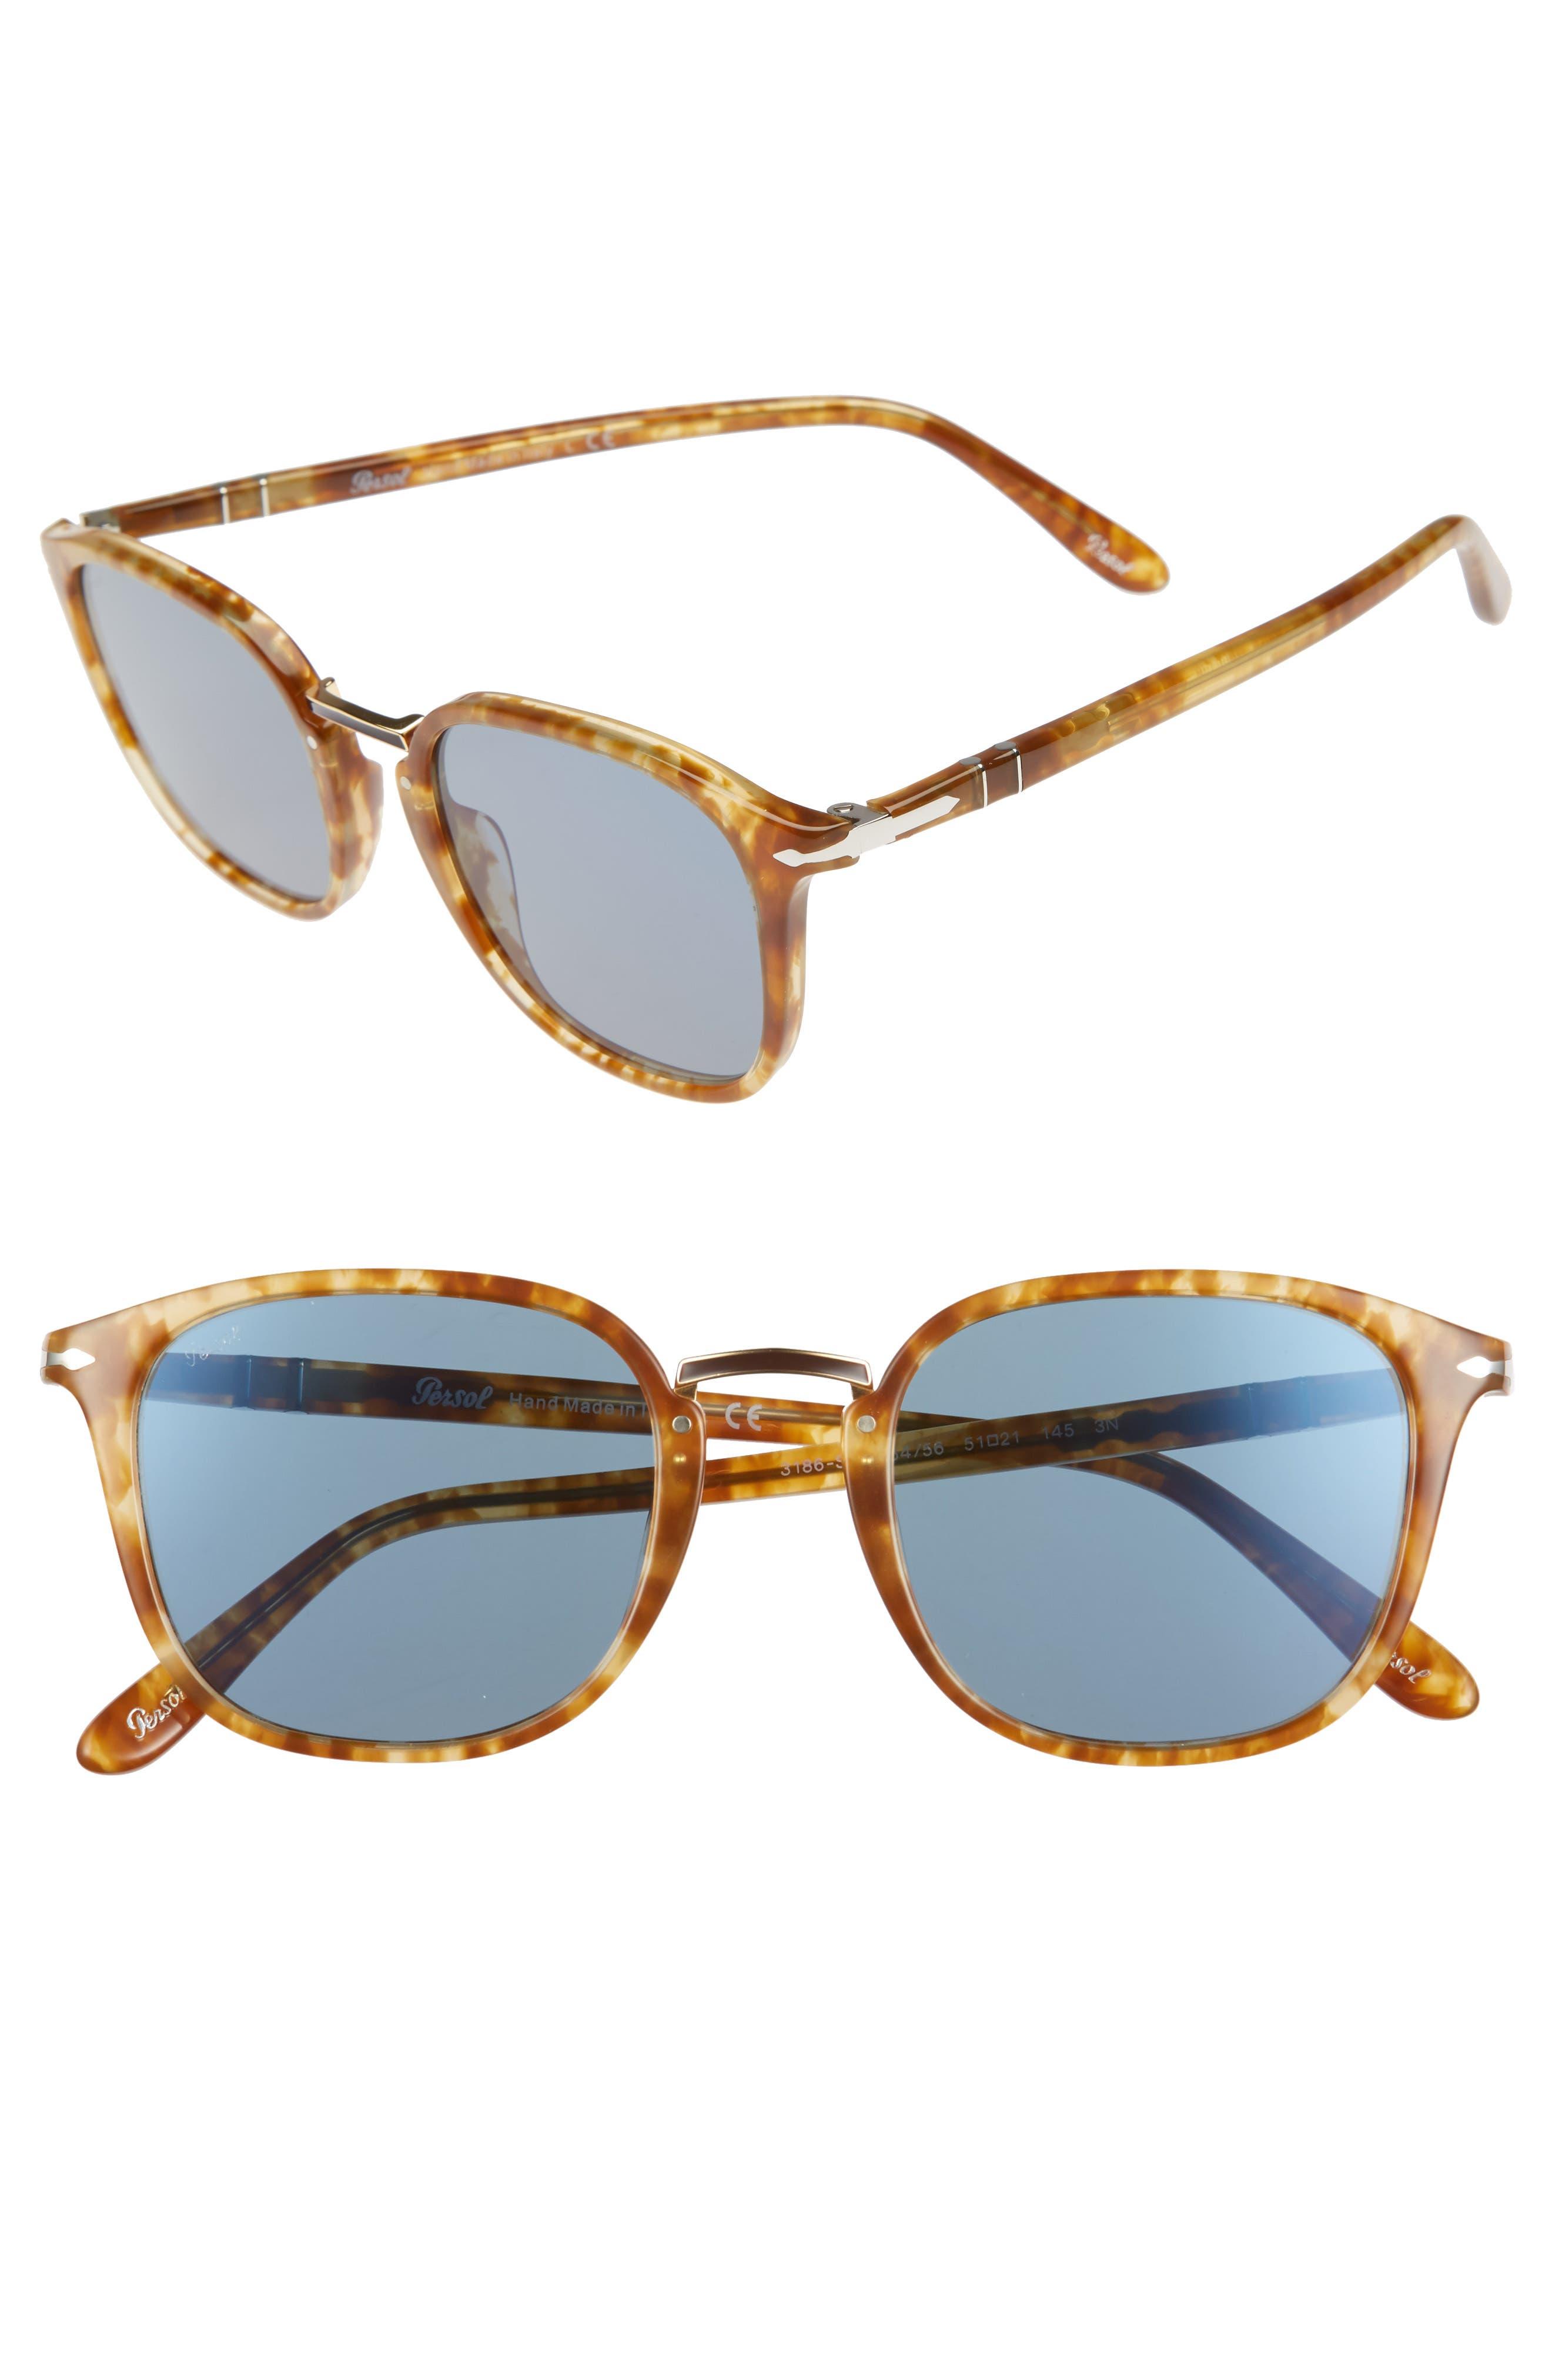 Phantos 51mm Crystal Lens Sunglasses,                             Main thumbnail 1, color,                             Beige Tortoise